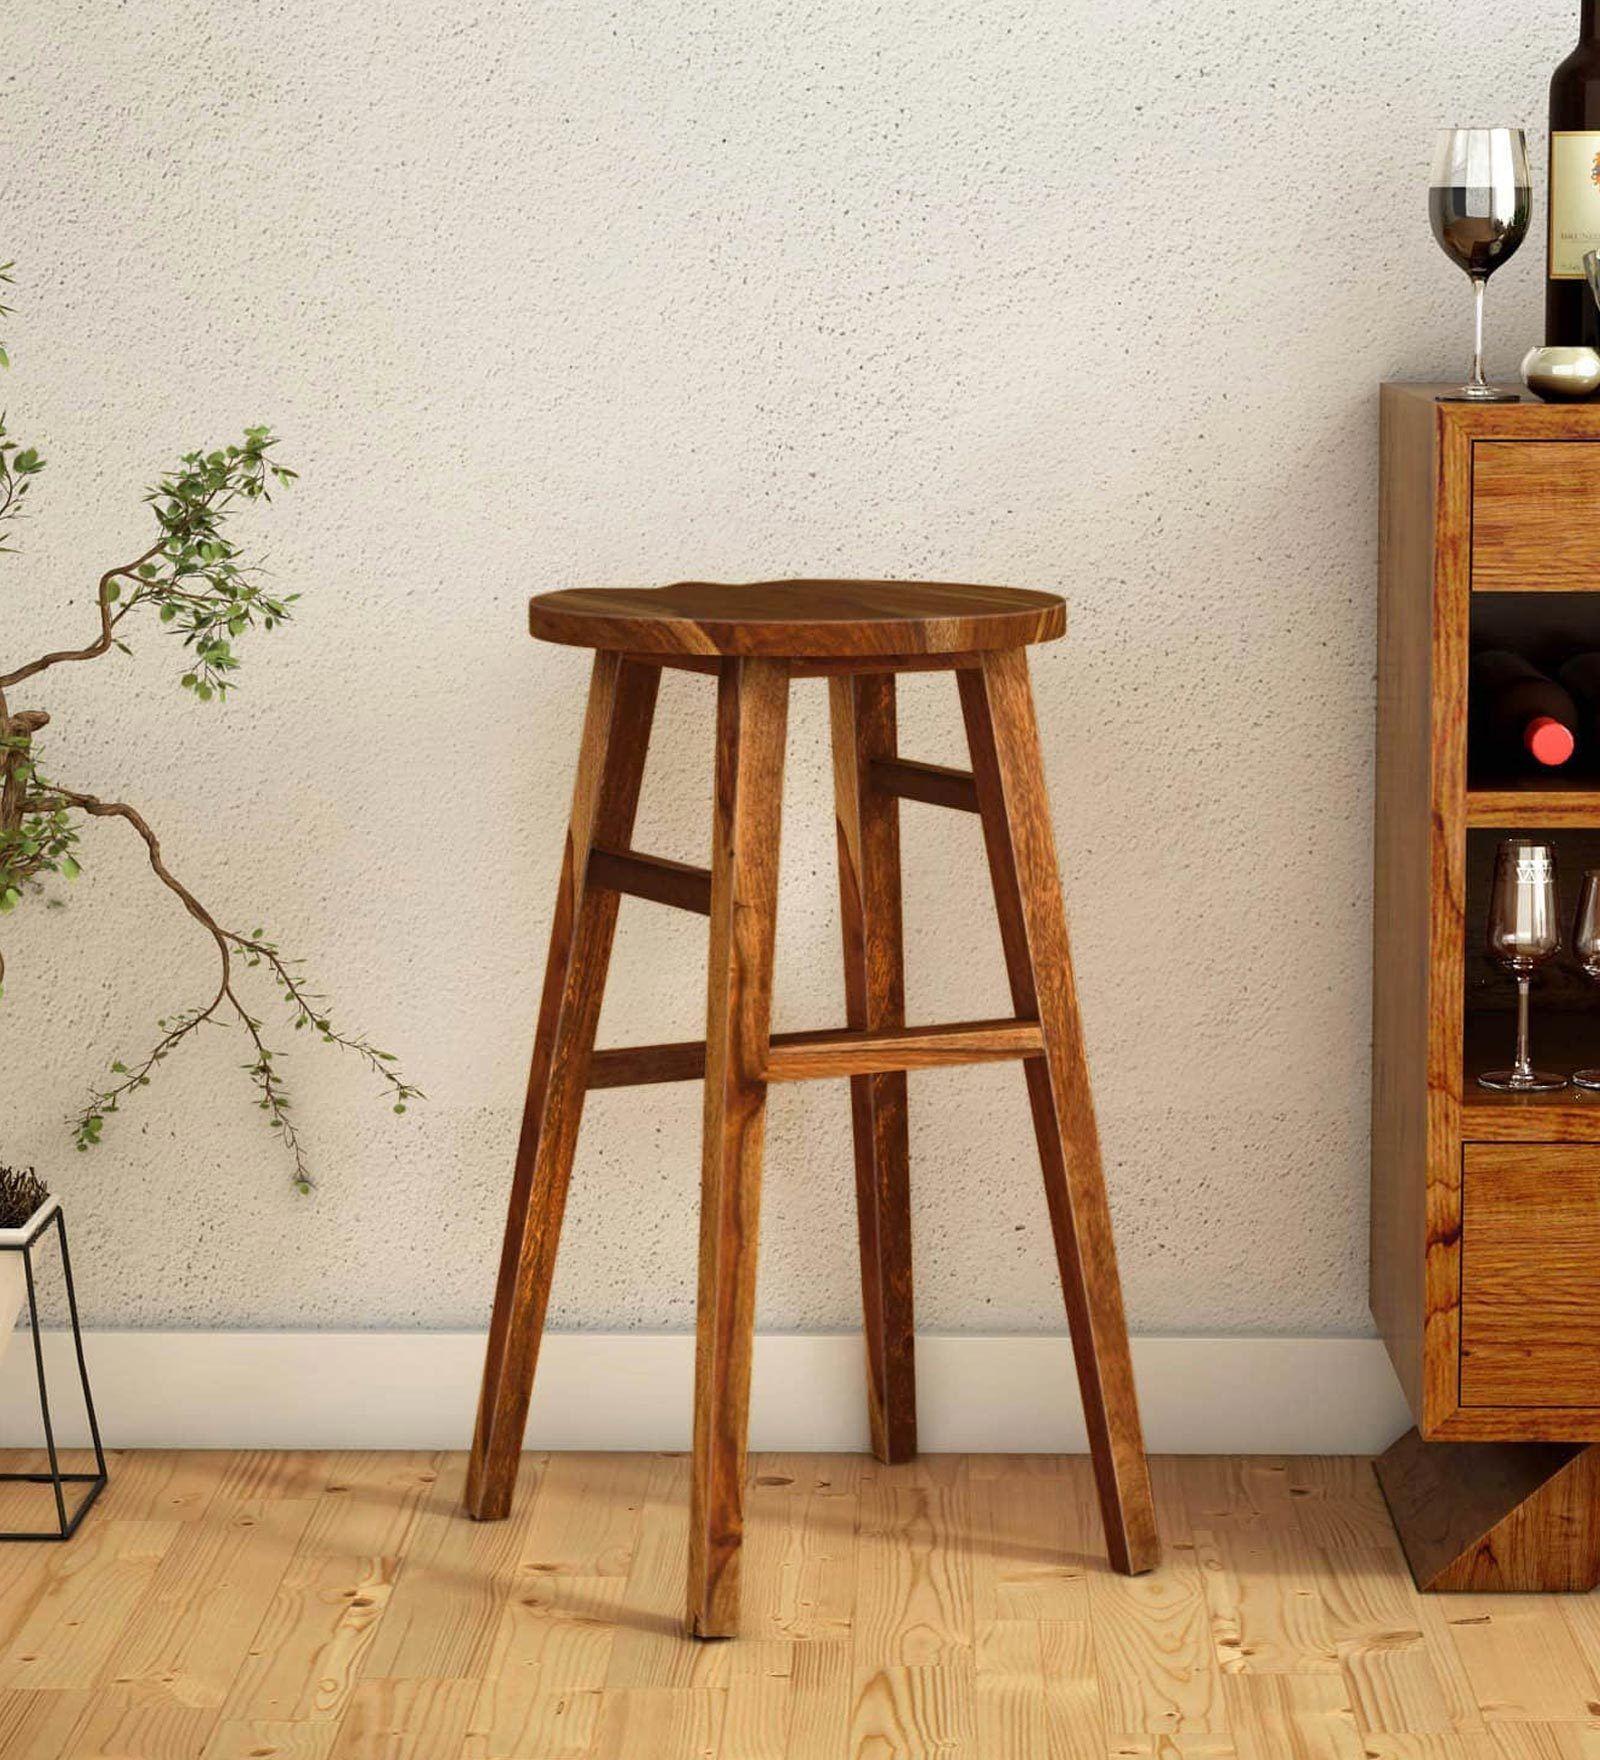 Harrington Solid Wood Bar Stool In Rustic Teak Finish By Woodsworth In 2020 Wood Bar Stools Bar Furniture Lounge Furniture